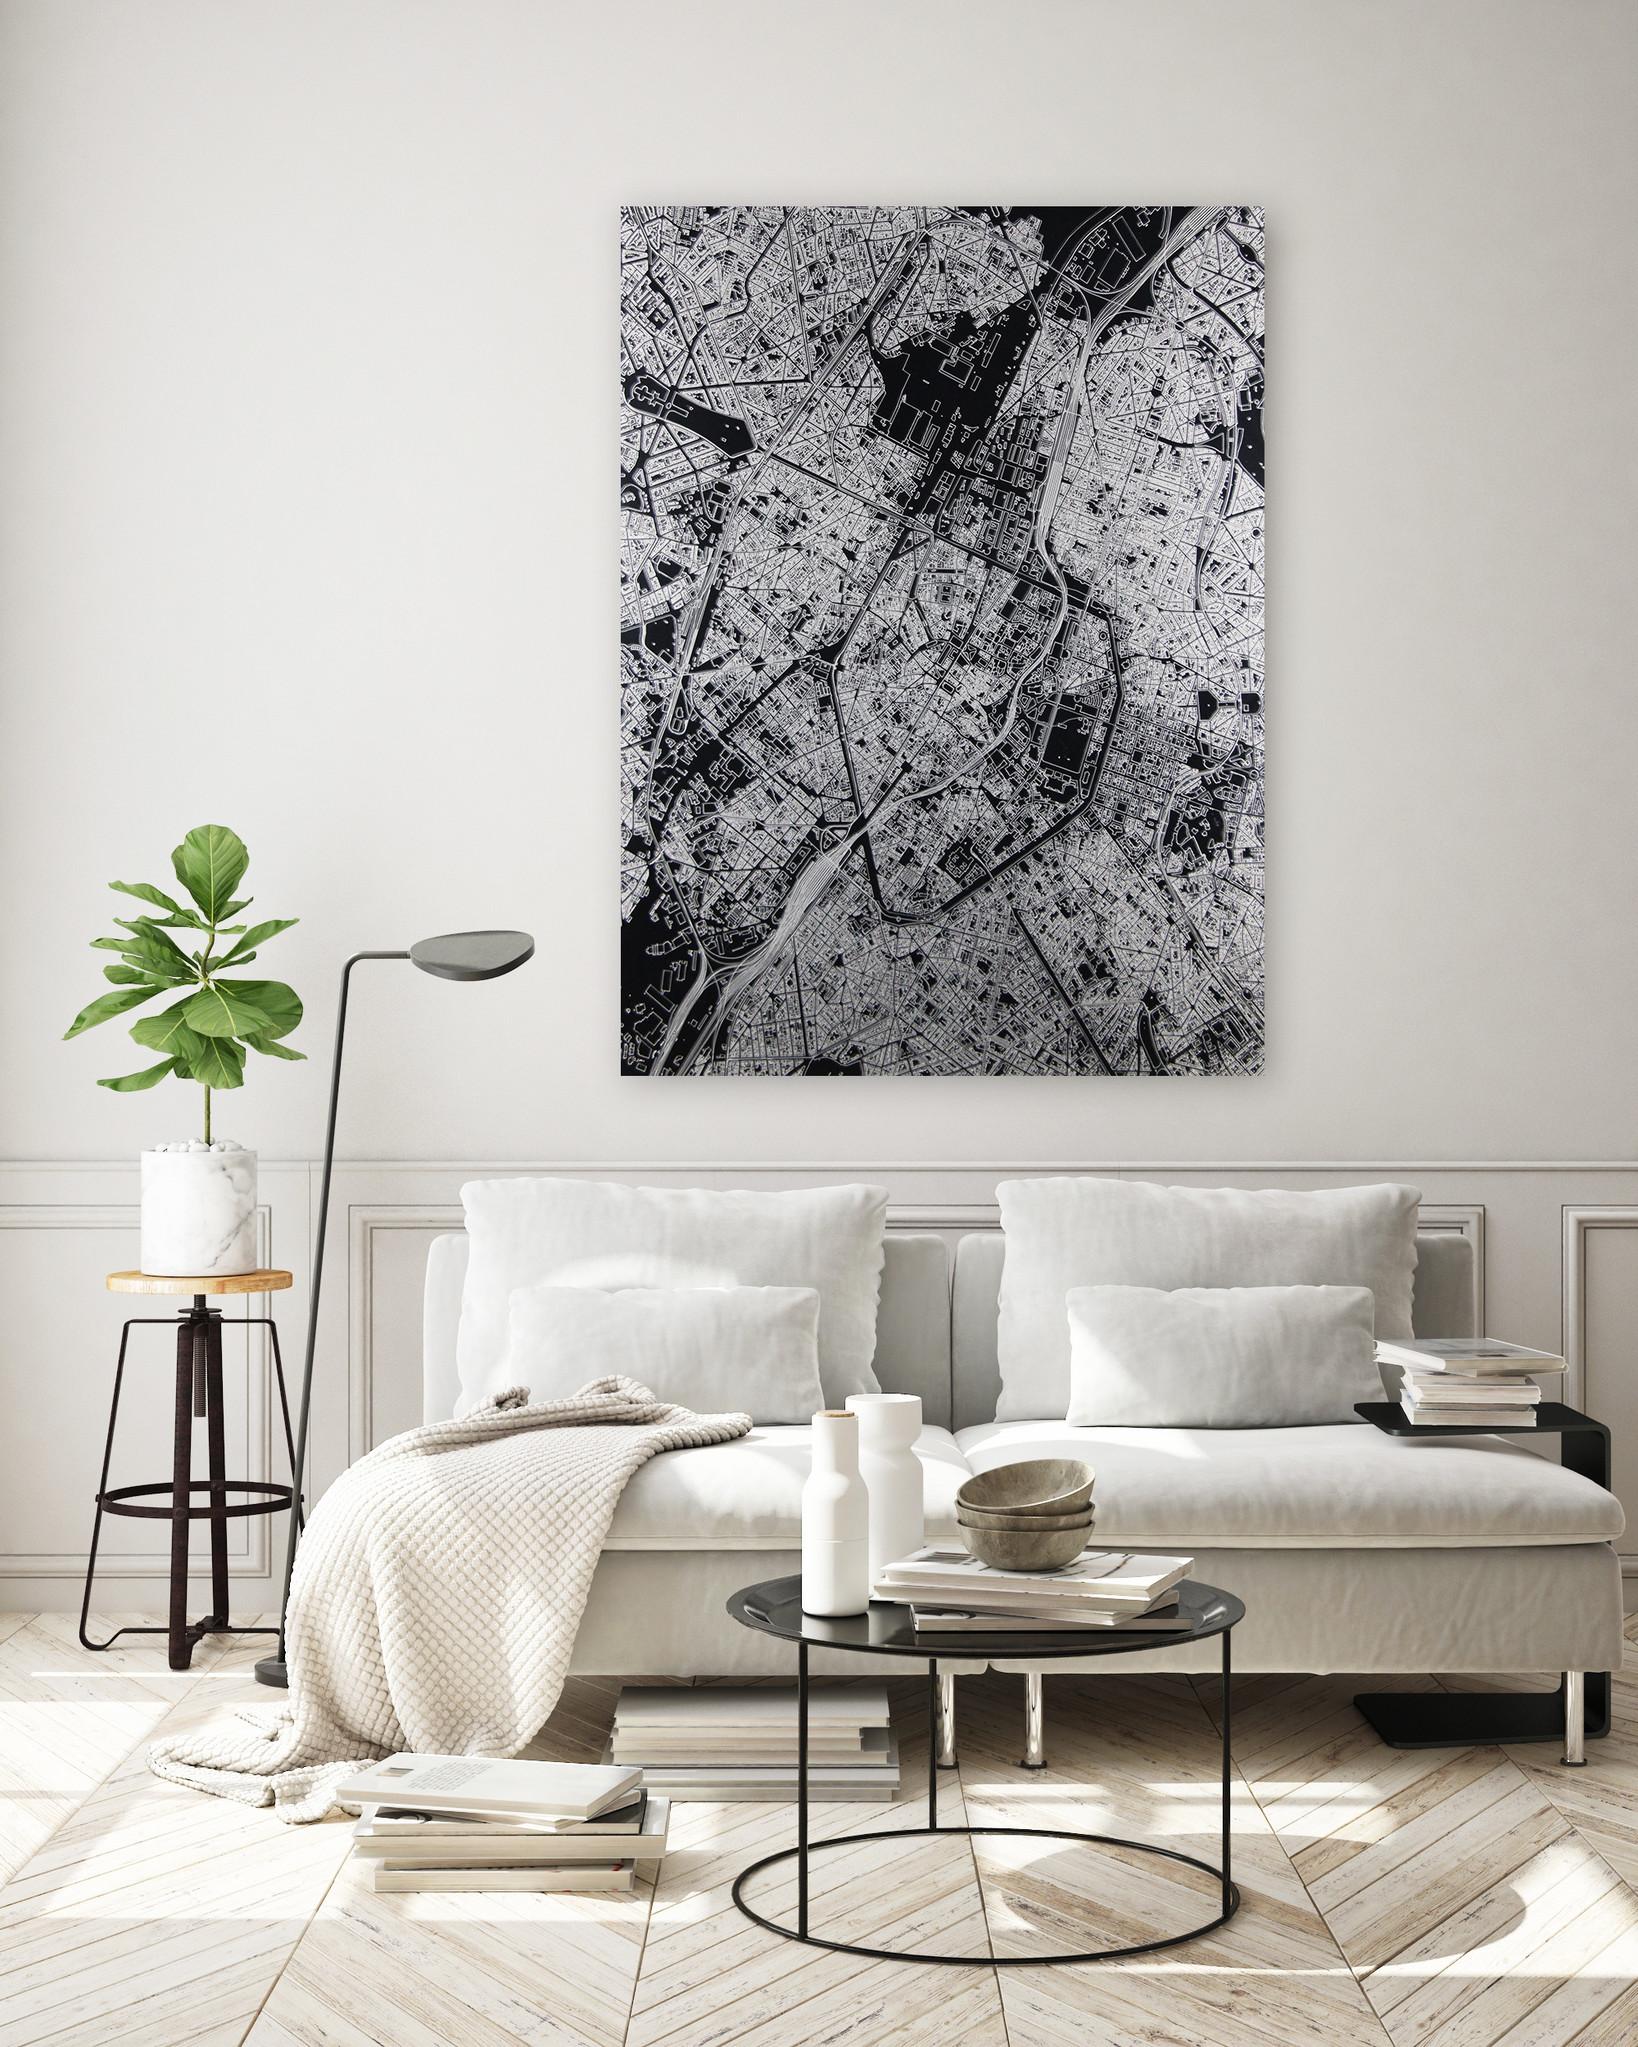 Stadtkarte Amersfoort | Aluminium Wanddekoration-2